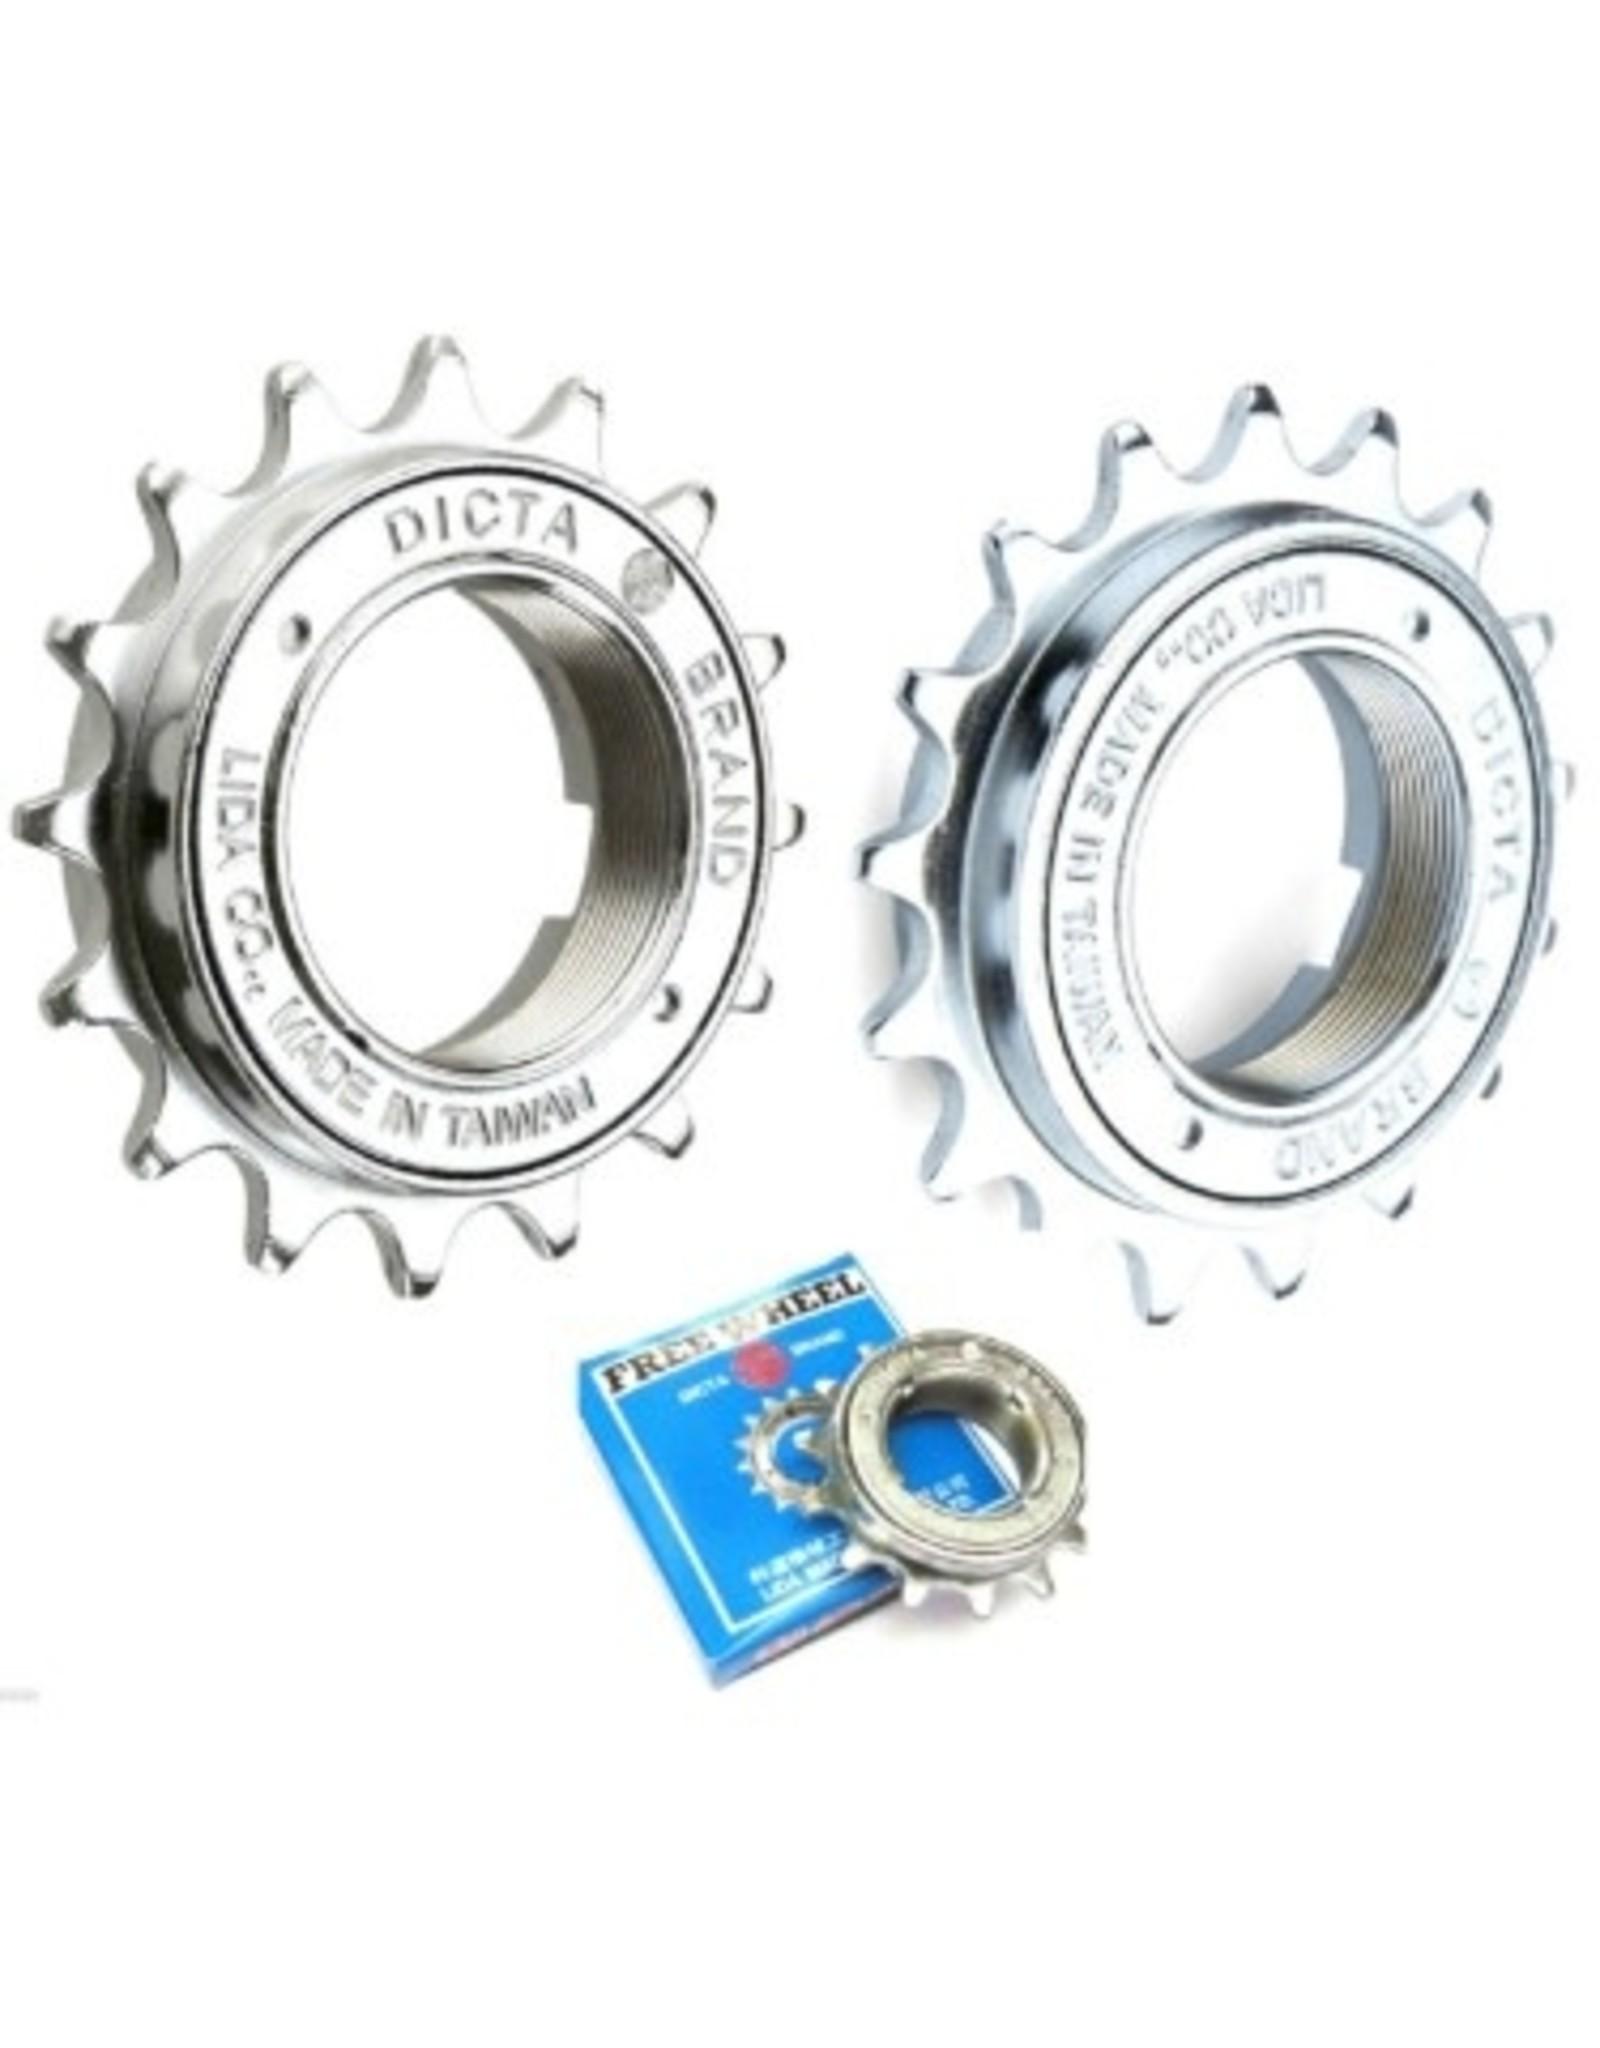 Dicta Basic Single Speed Freewheel